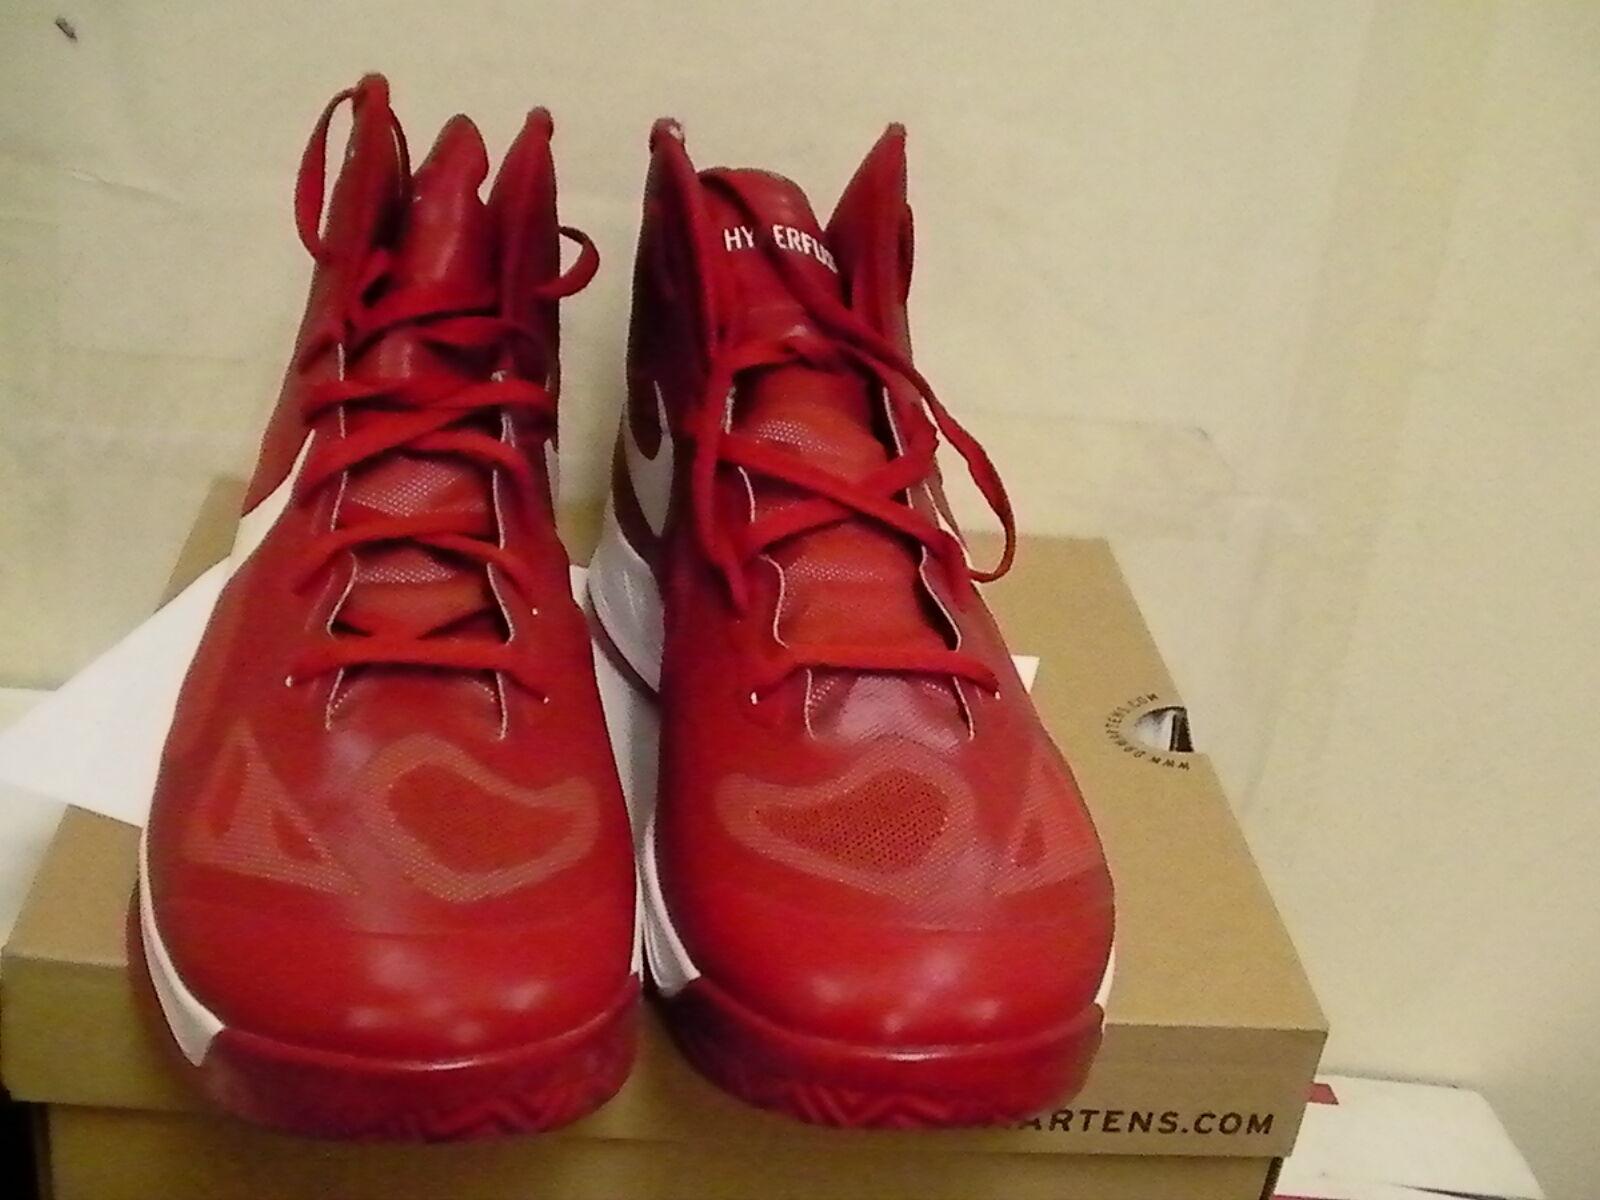 Nike hyperfuse luce scarpe da basket nuove dimensioni 17